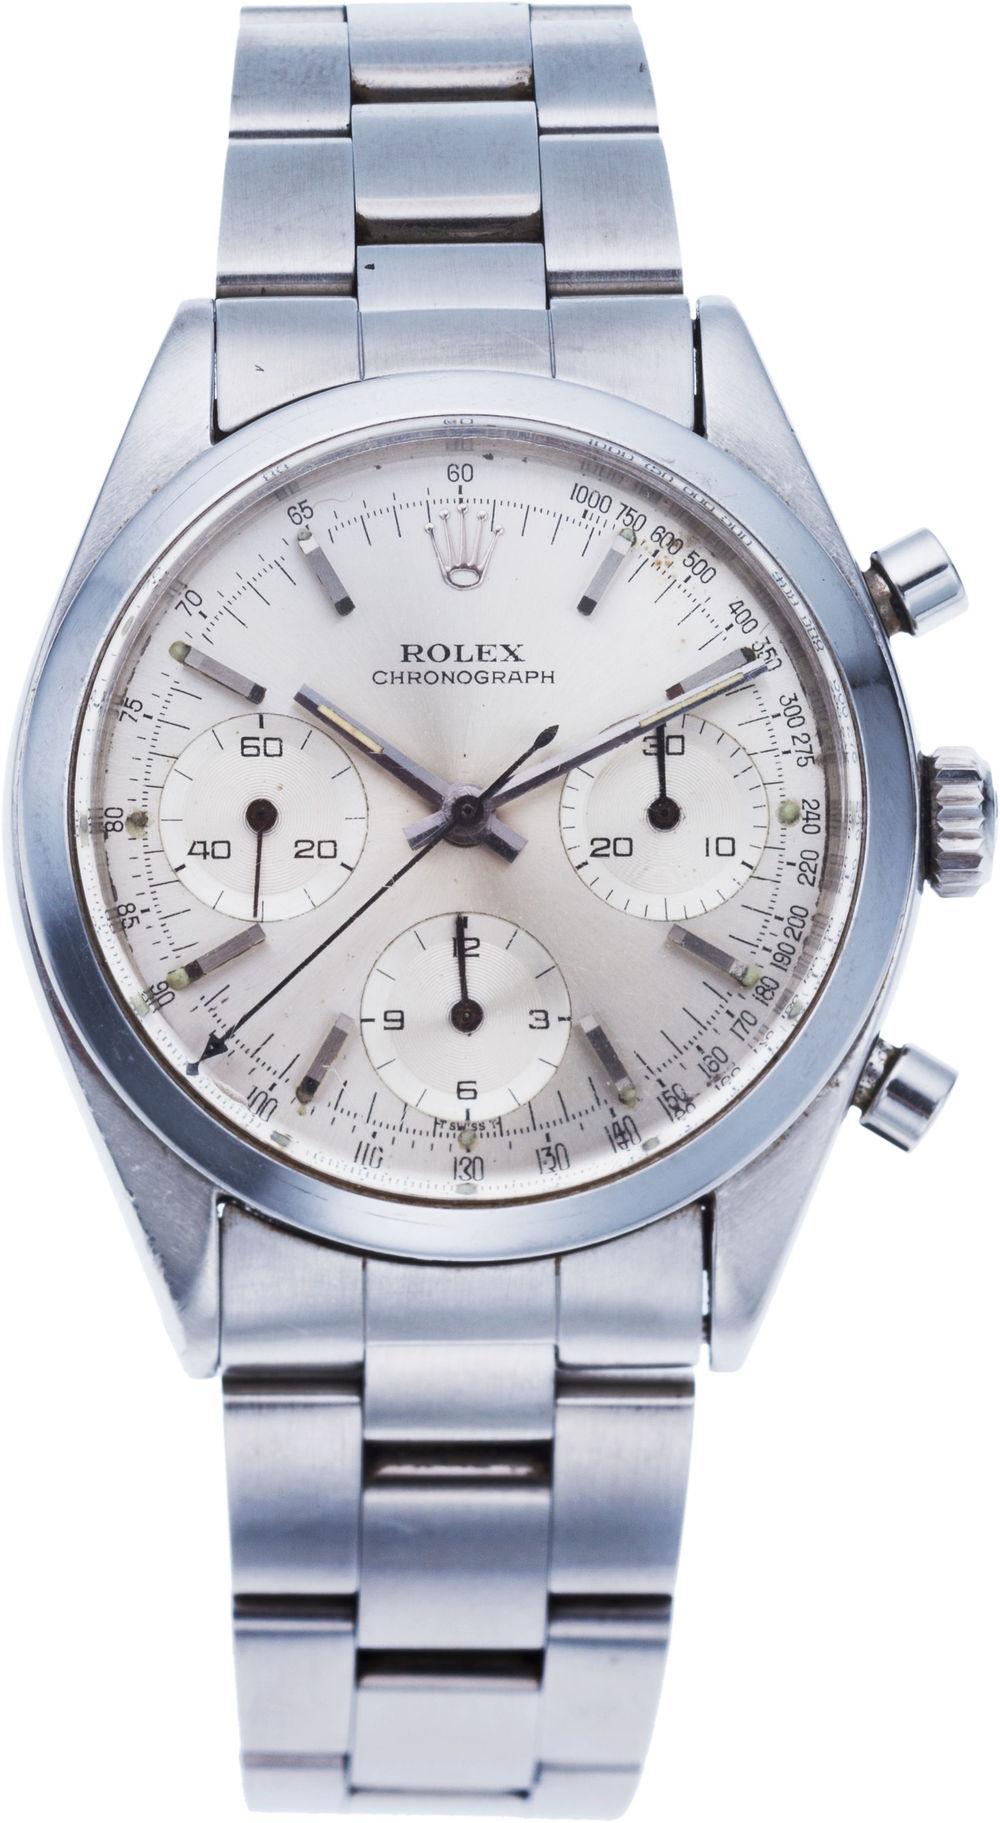 Rolex 1964.jpeg